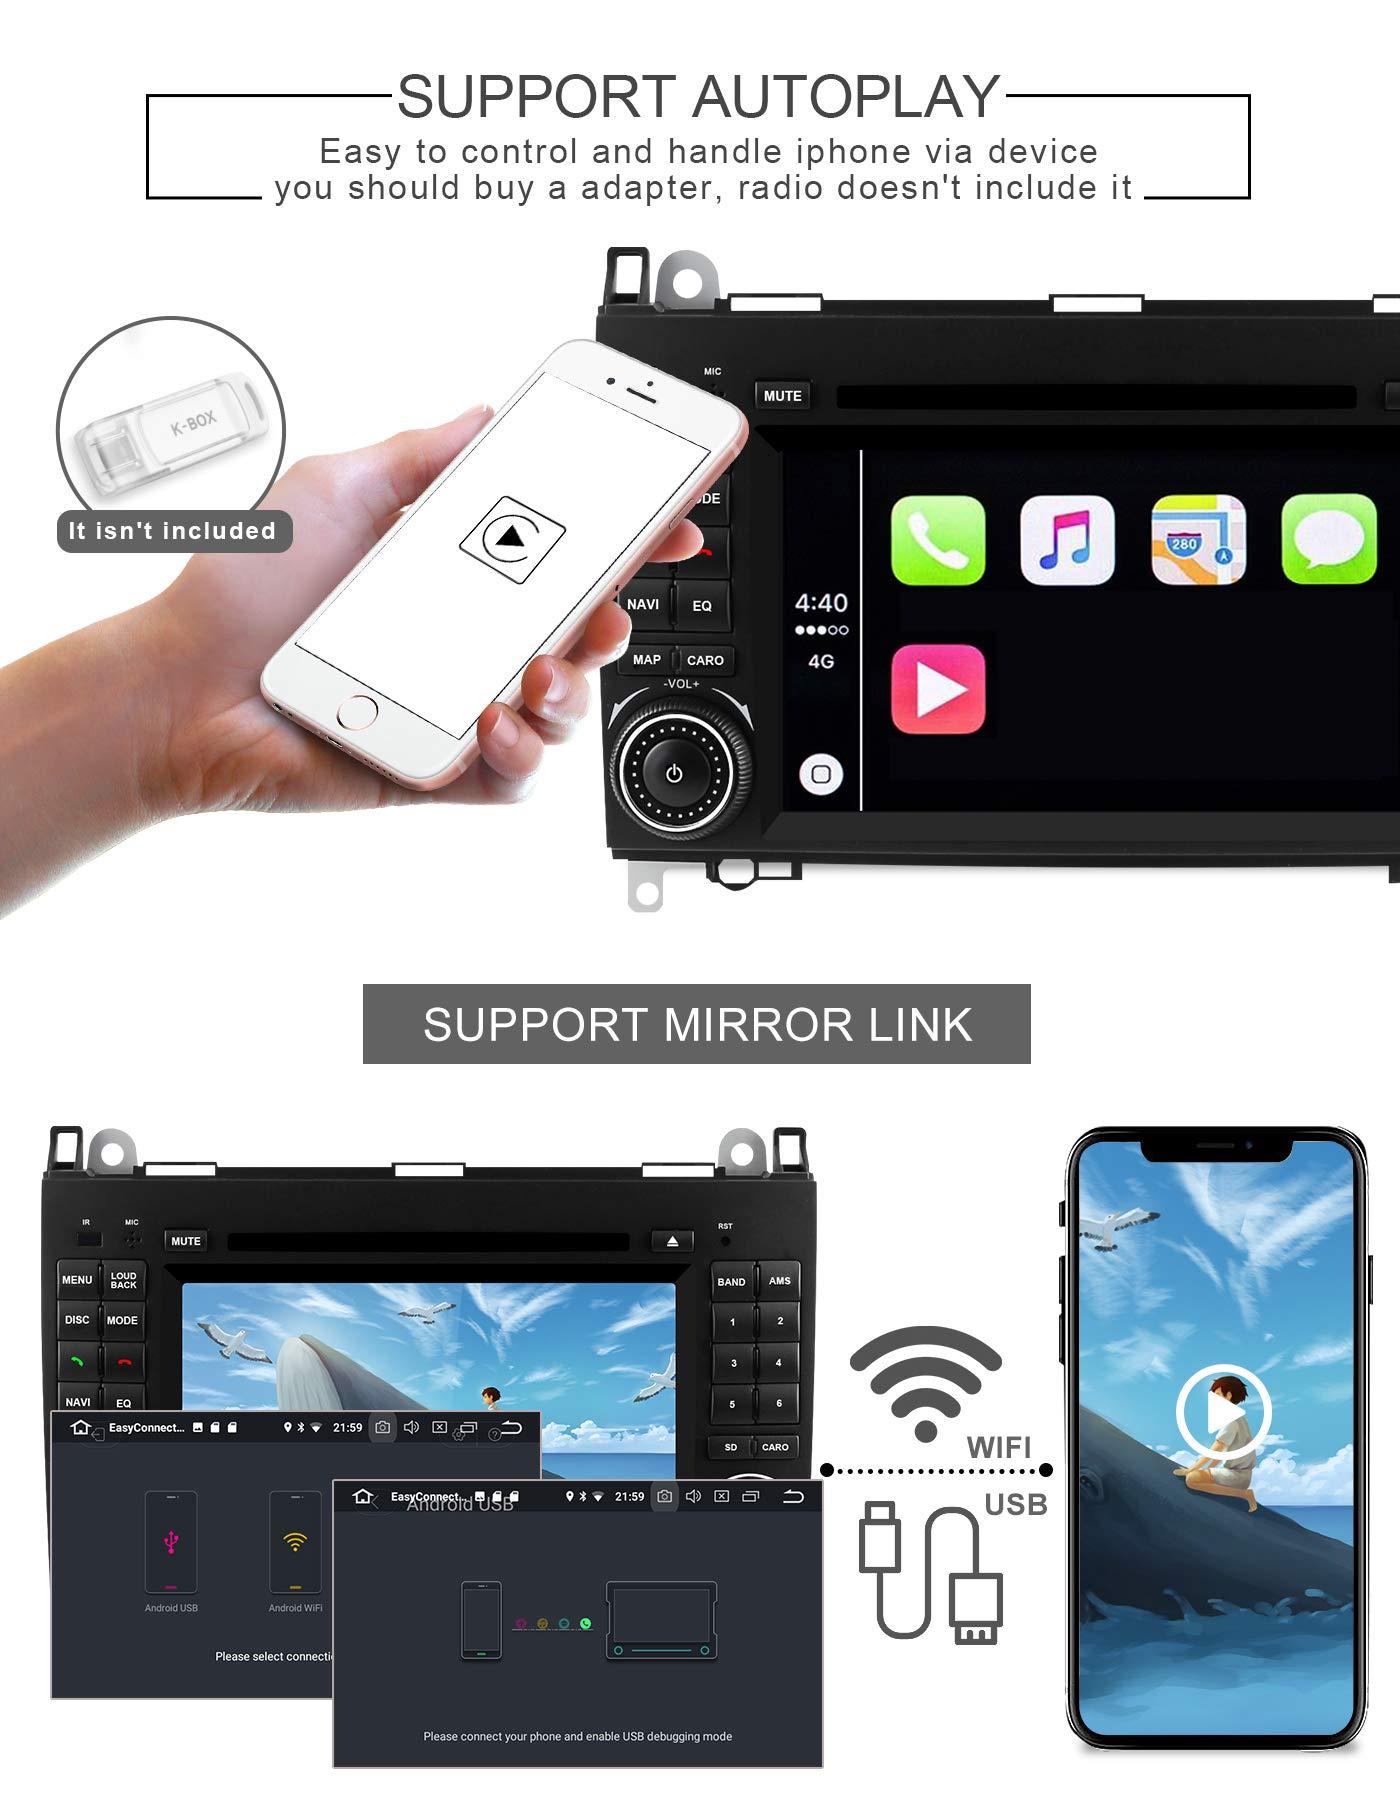 Aumume-Android-90-Autoradio-fr-Mercedes-Benz-Sprinter-B200-B-Class-W245-B170-W169-mit-Navi-Untersttzt-Autoplay-Mirrorlink-Bluetooth-DAB-WiFi-USB-CD-DVD